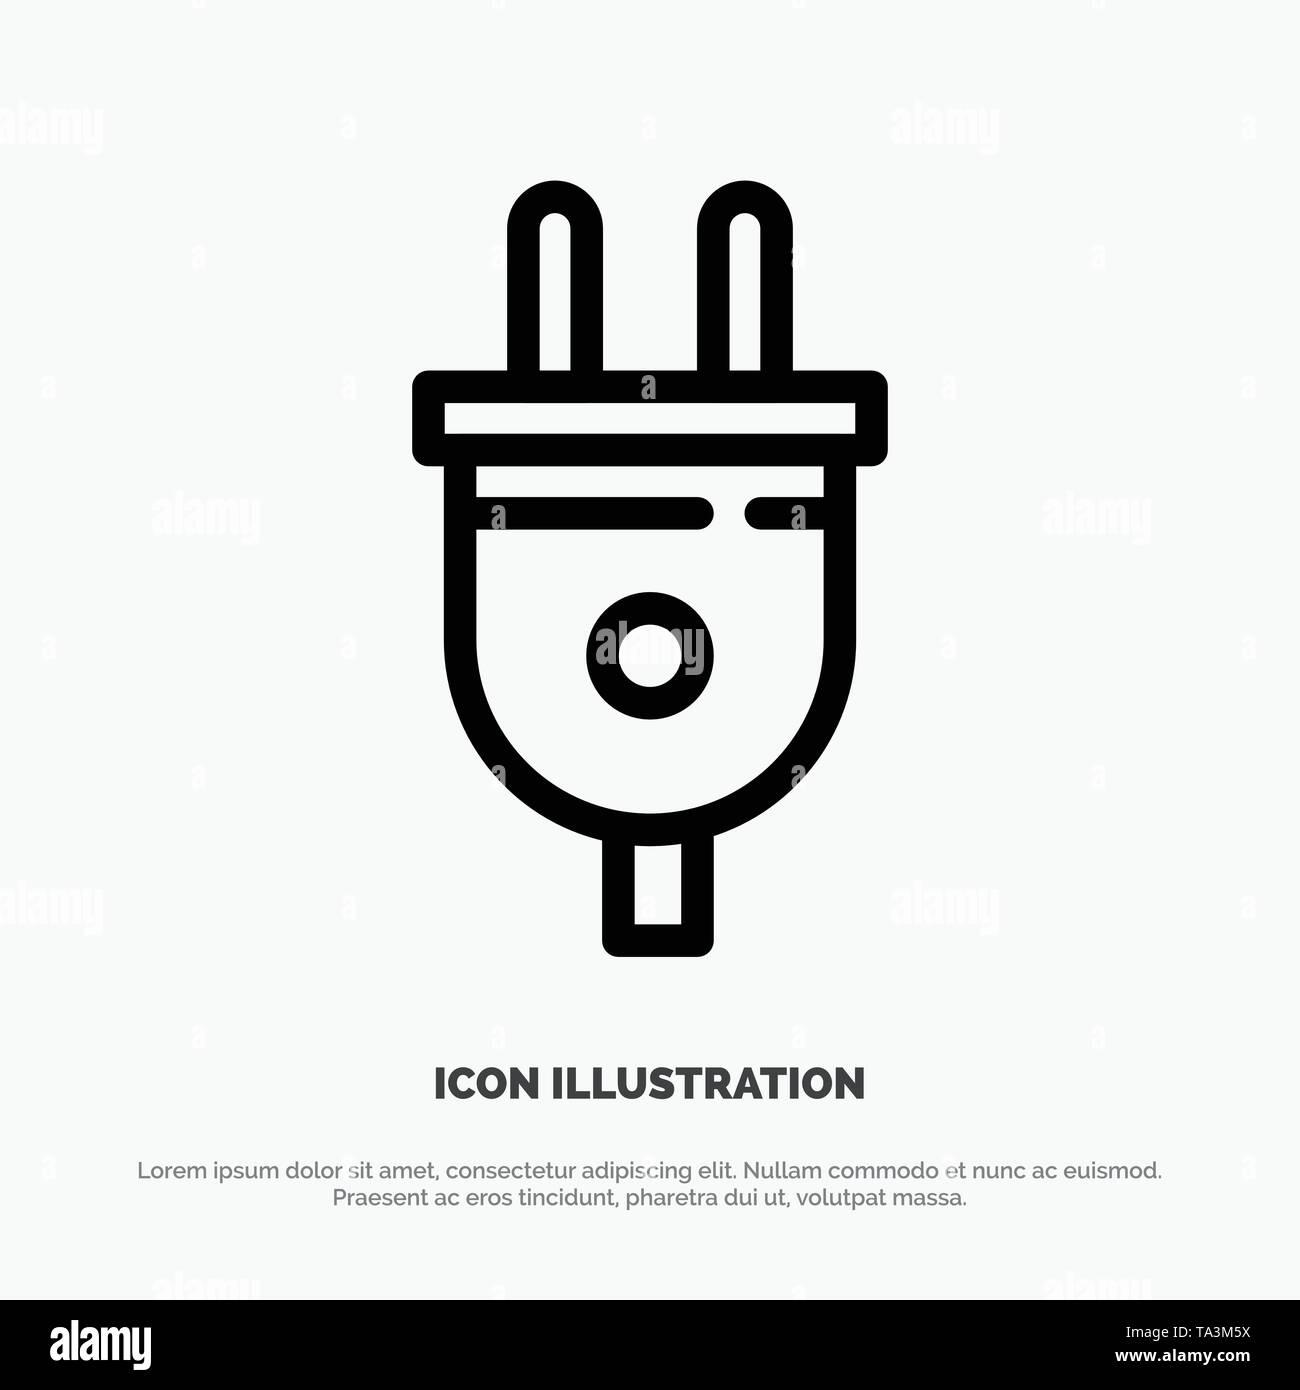 Electric, Plug, Power, Power Plug Vector Line Icon - Stock Image